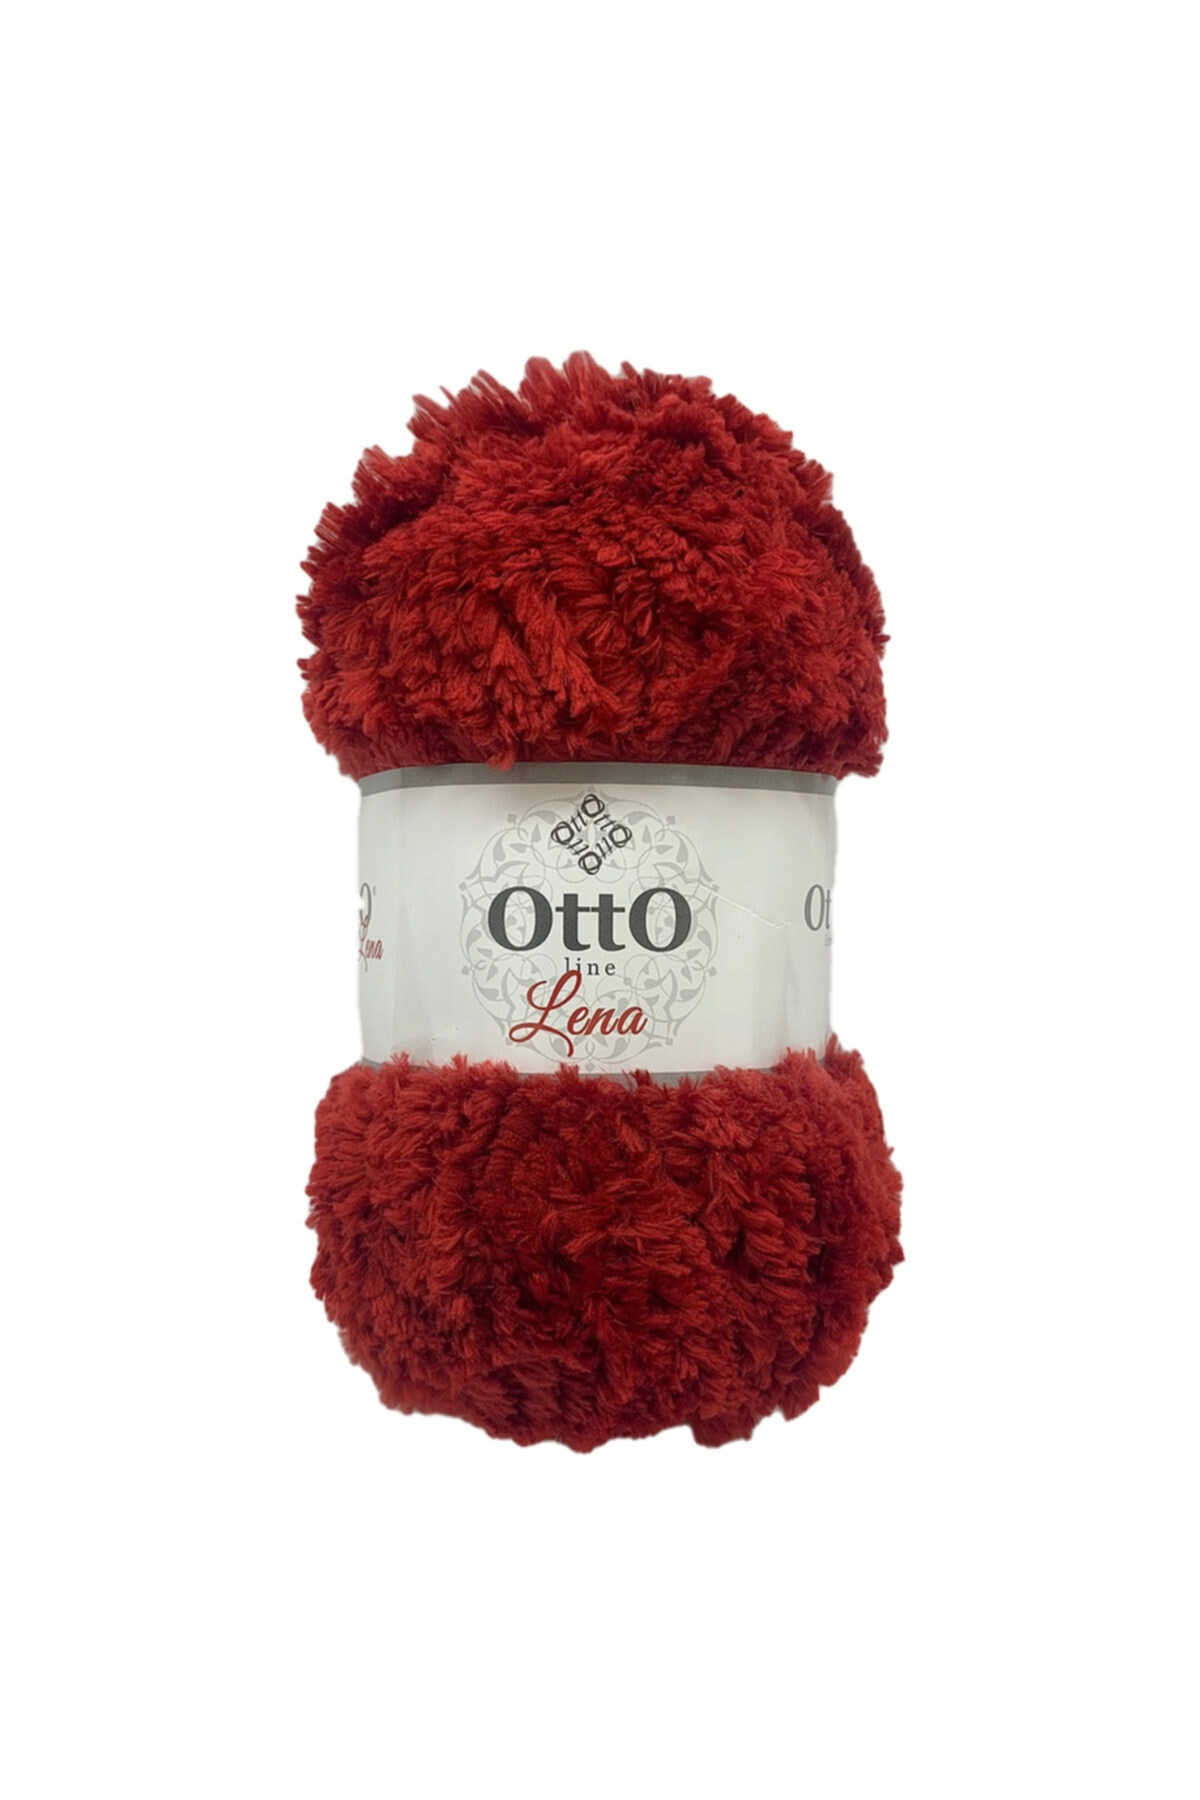 Otto Lena 13 (kırmızı) El Örgü Ipi 1 Adet 2